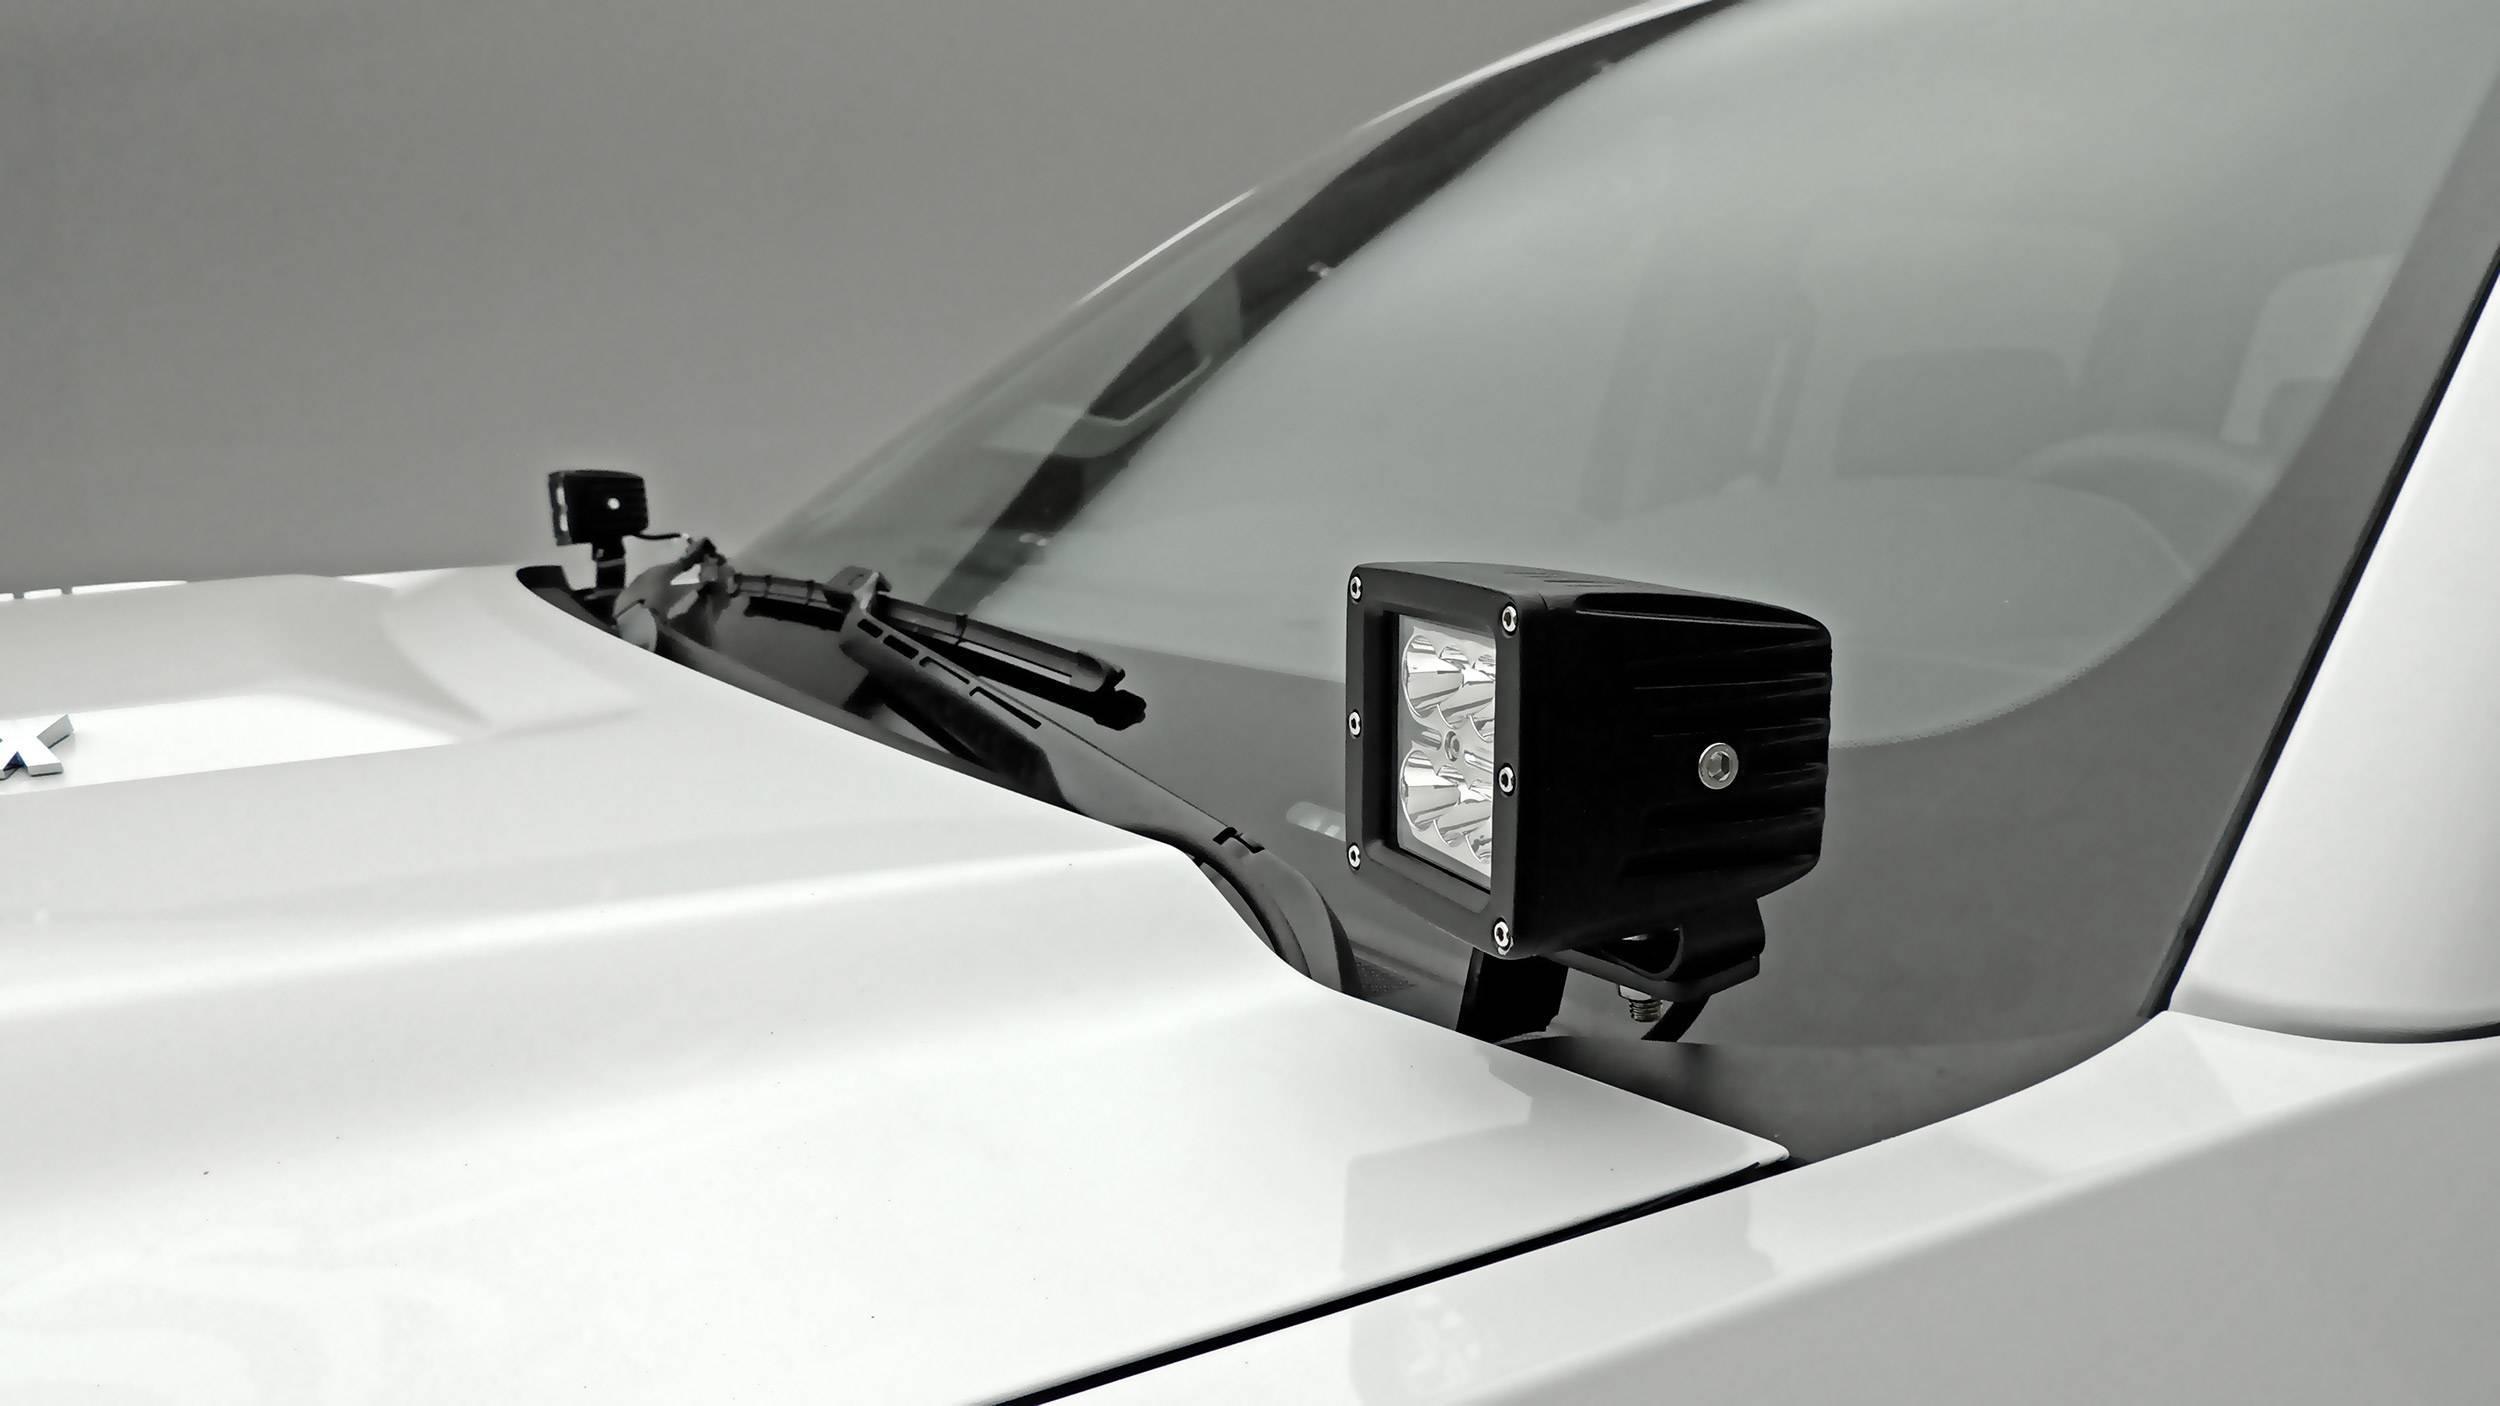 ZROADZ OFF ROAD PRODUCTS - 2015-2019 Silverado 2500, 3500 Hood Hinge LED Bracket to mount (2) 3 Inch LED Pod Lights - PN #Z361221